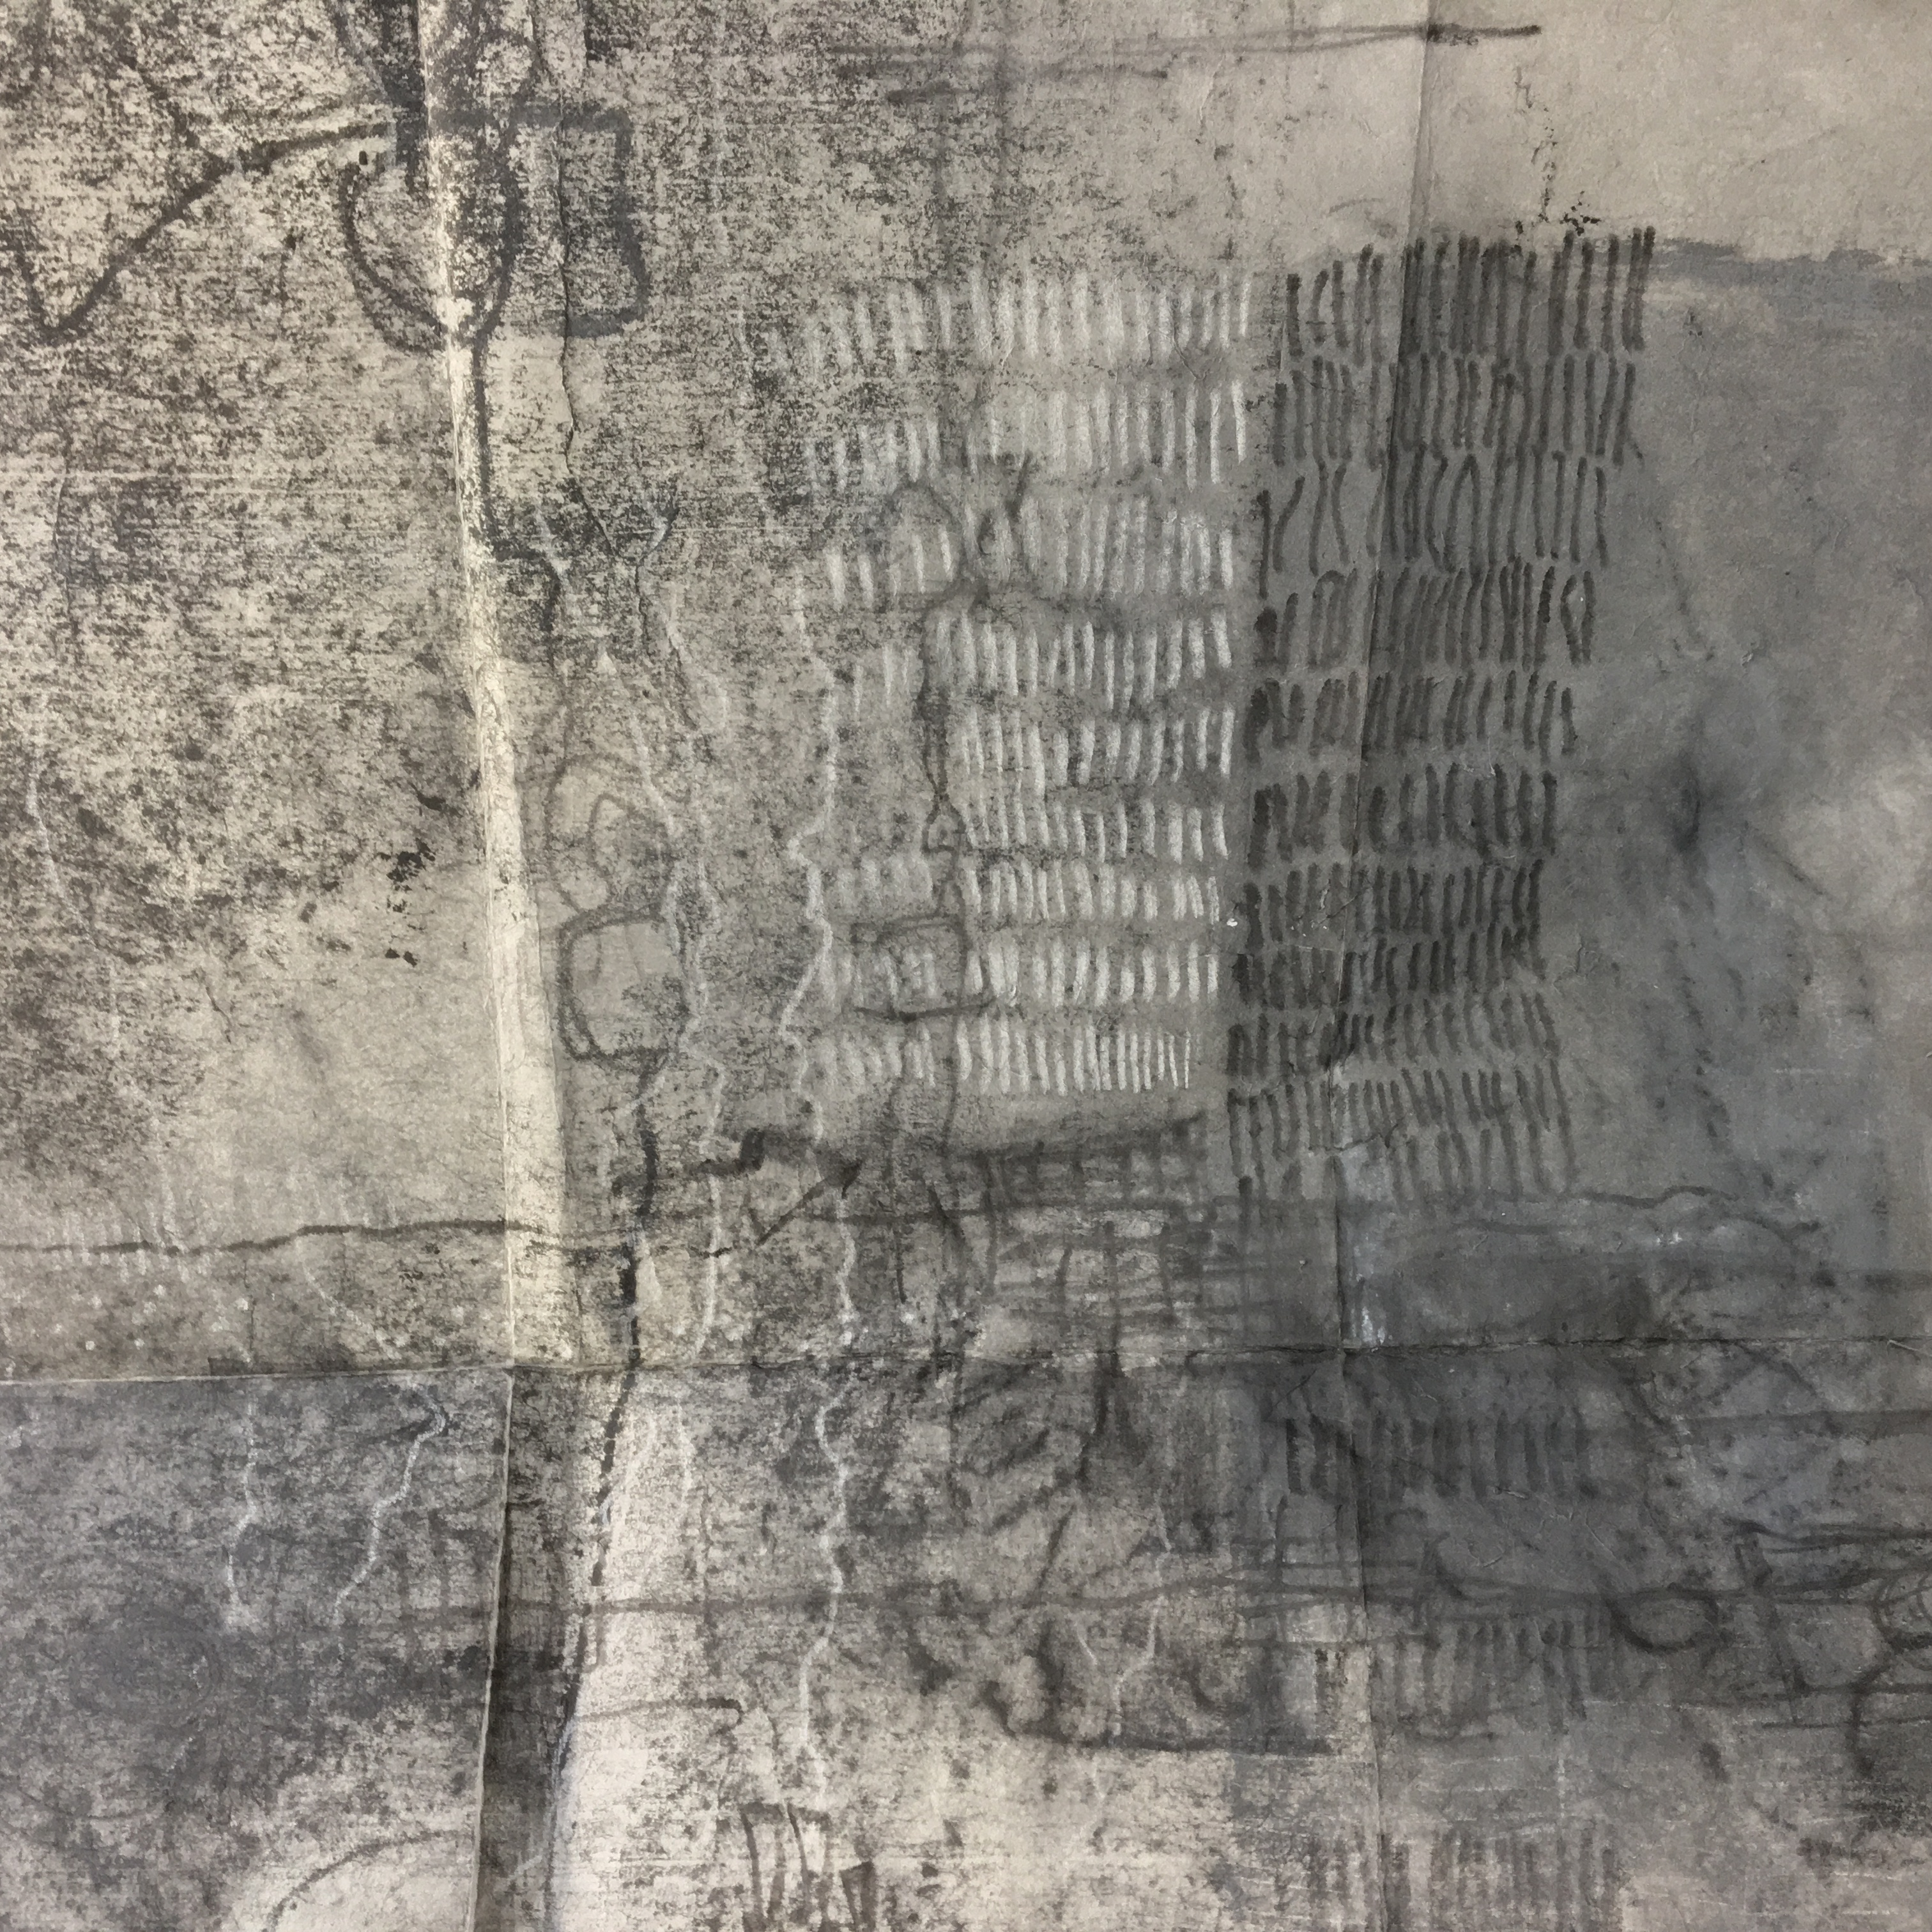 Footpath Cartograph (detail), 2017